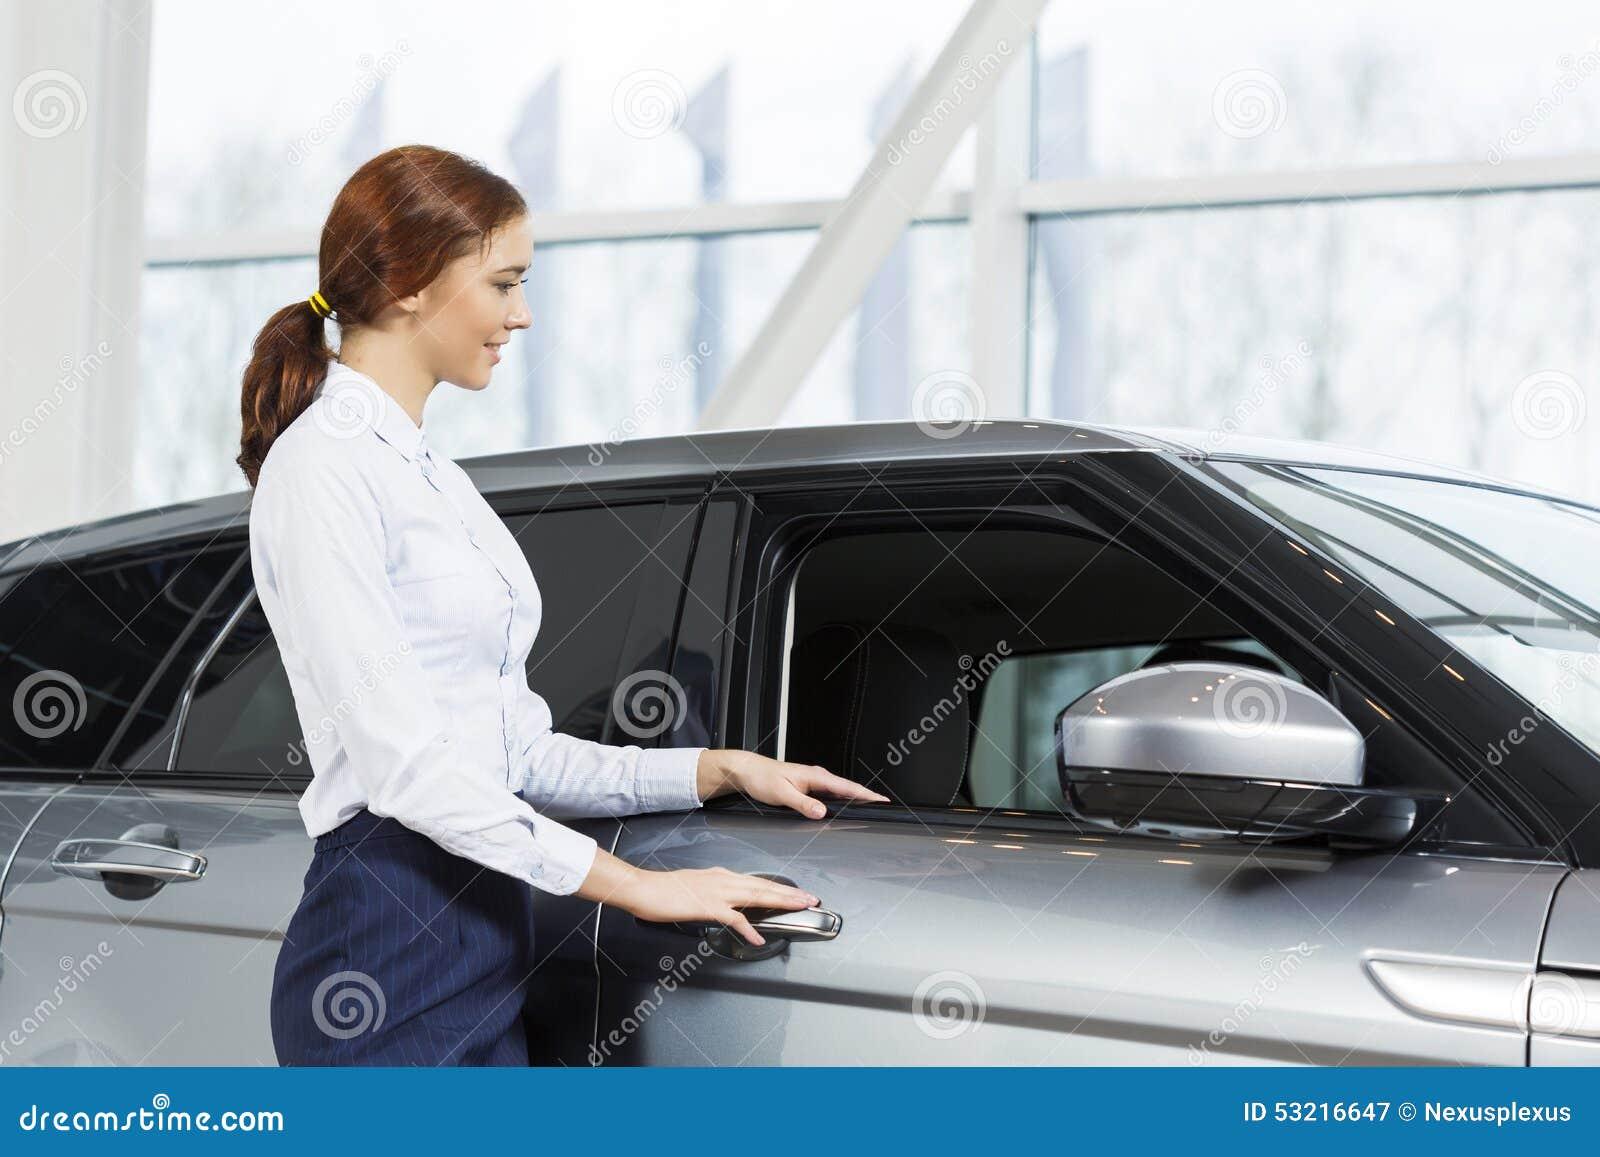 i will help you to choose car stock image image of transportation mechanic 53216647. Black Bedroom Furniture Sets. Home Design Ideas